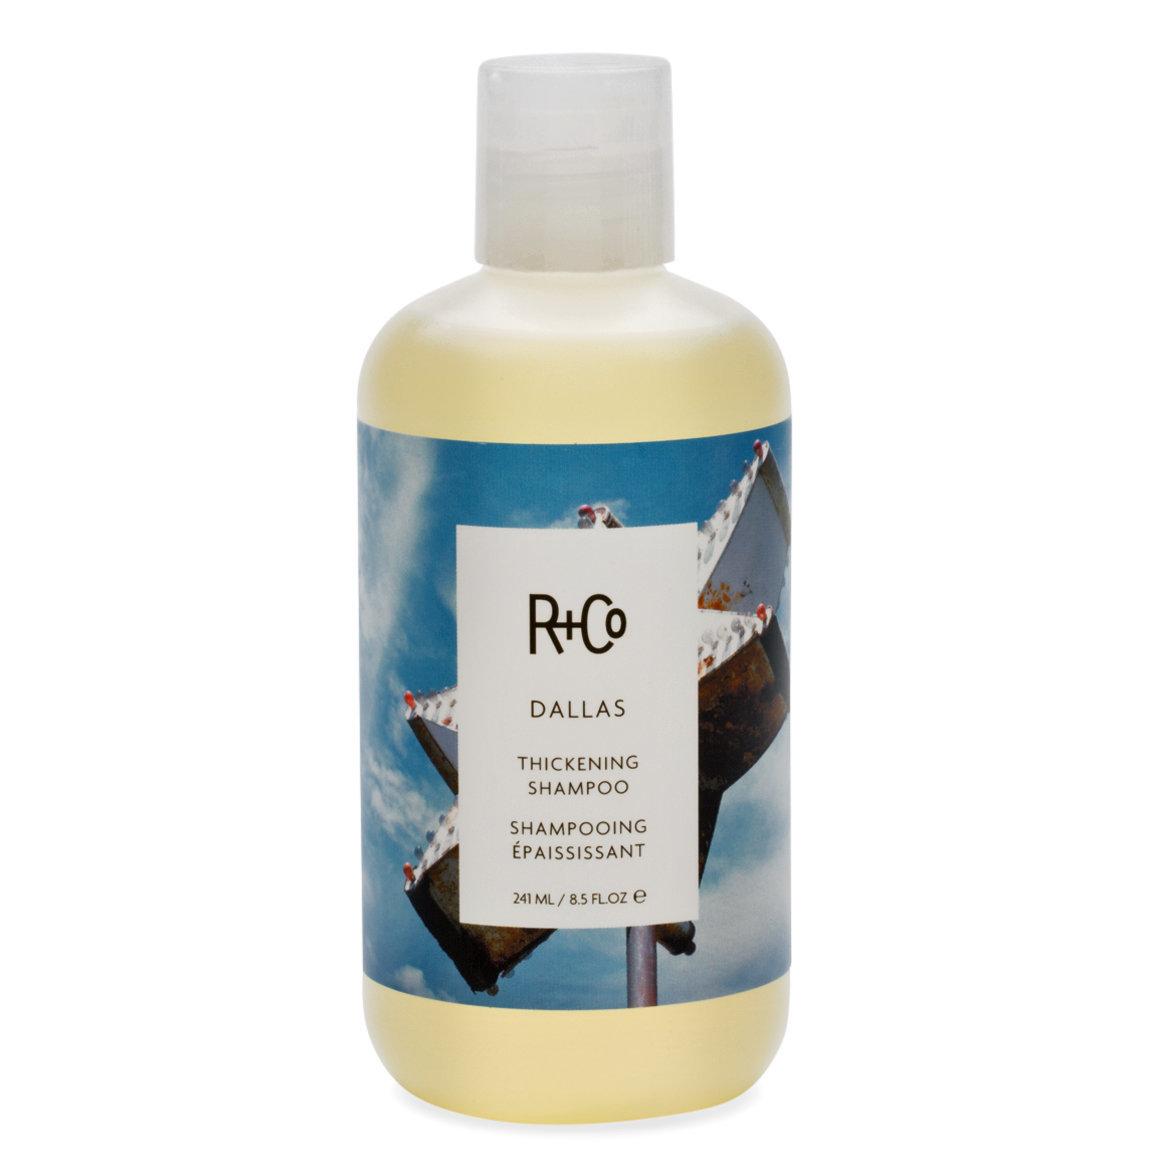 R+Co Dallas Thickening Shampoo 8.5 oz product swatch.